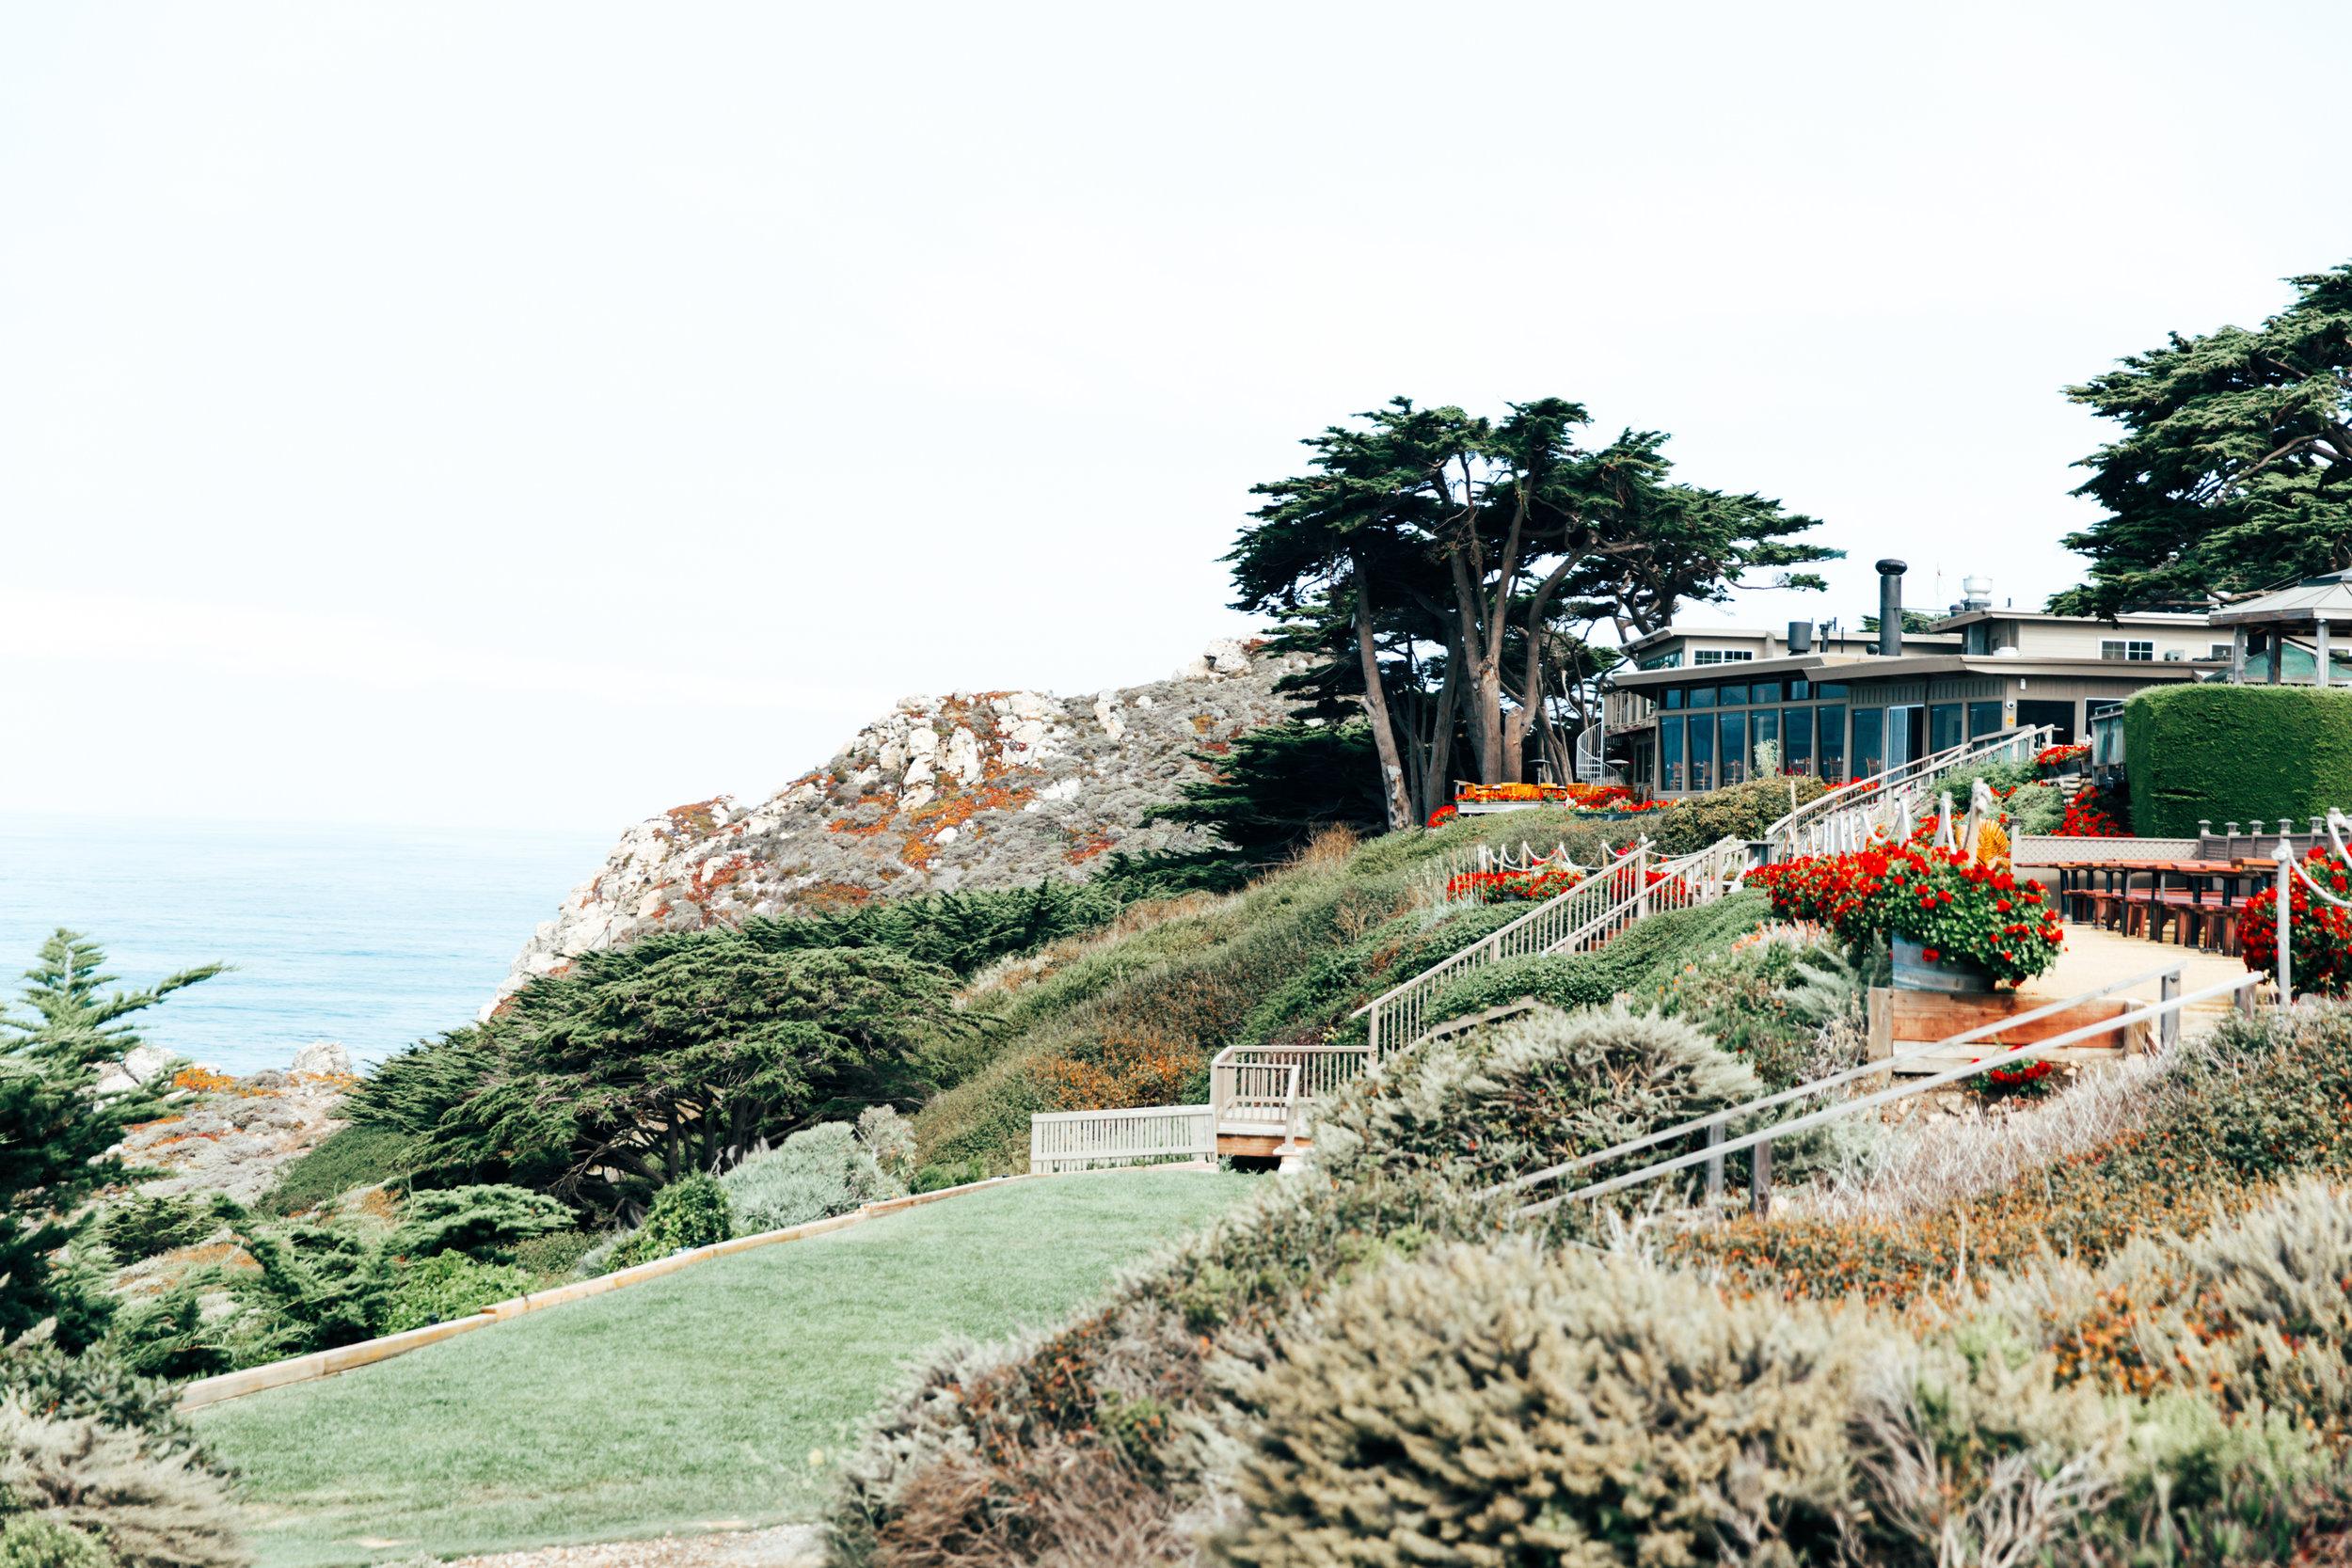 Stay_Driven_Monterey_Car_Week_Koenigsegg-44.jpg